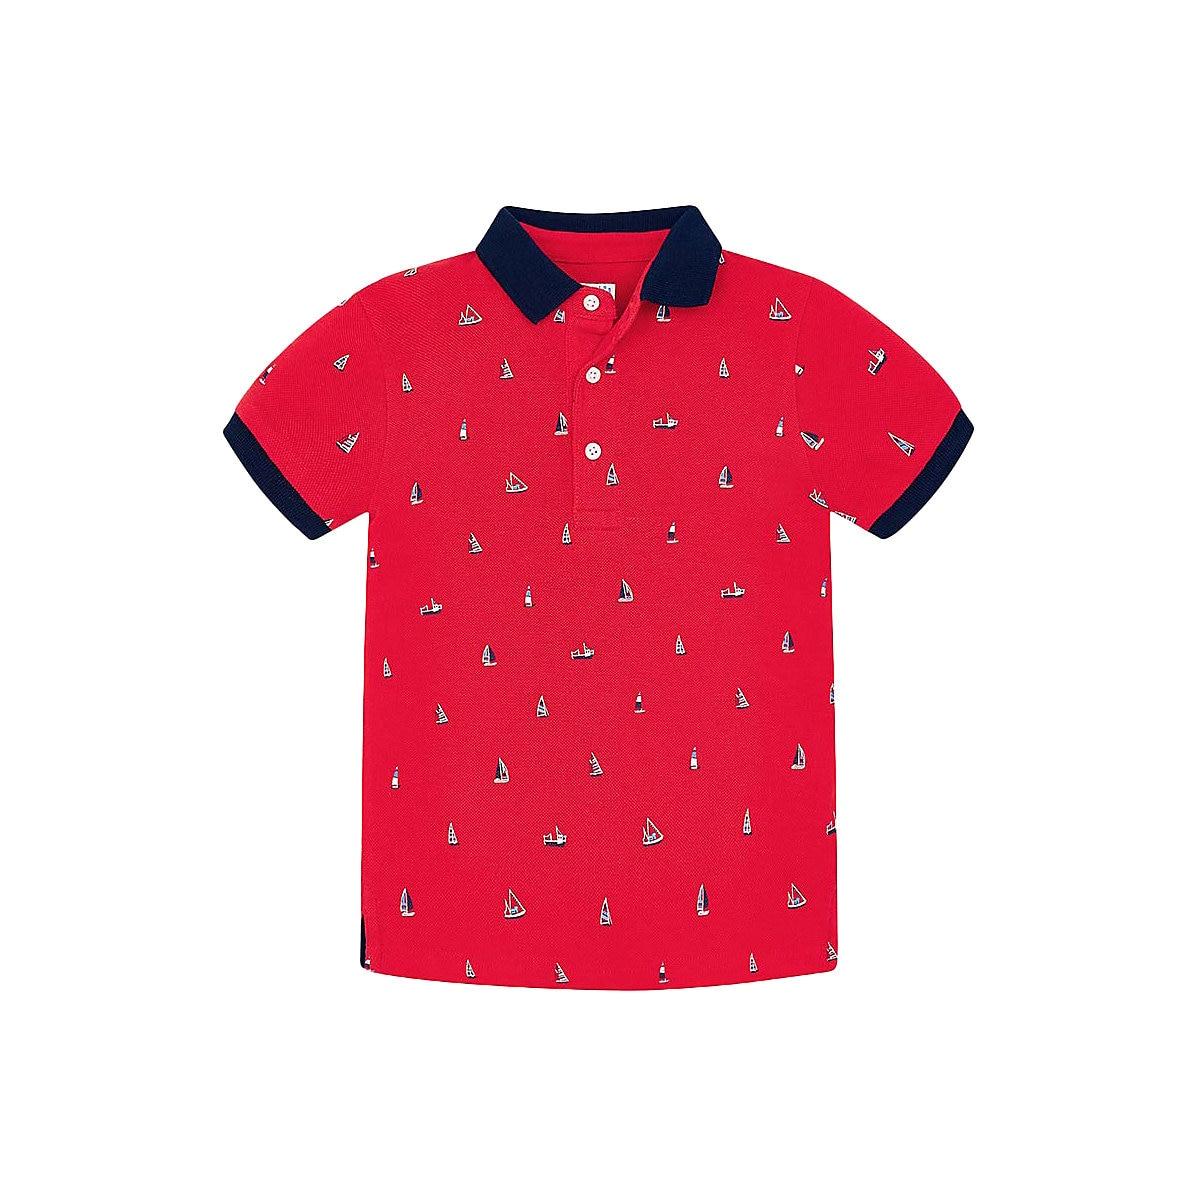 MAYORAL Polo Shirts 10685364 children clothing t-shirt shirt the print for boys tiger 3d print basic t shirt